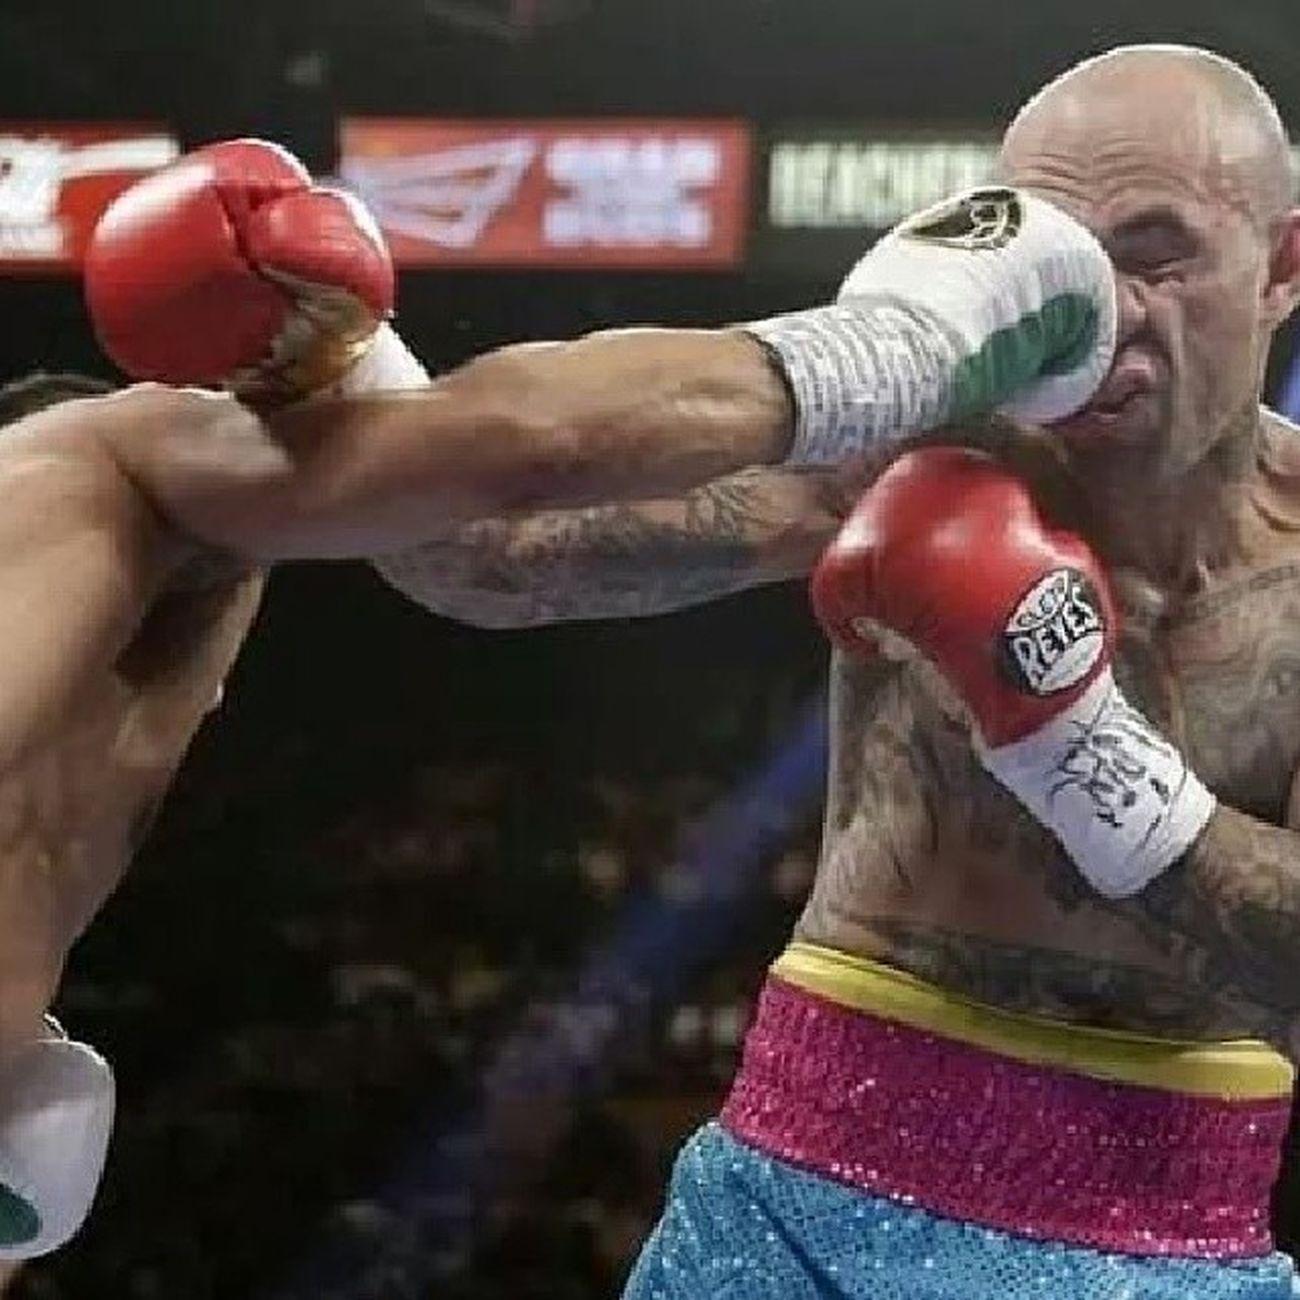 KingKhan Boxing RightInTheFace Instagram won